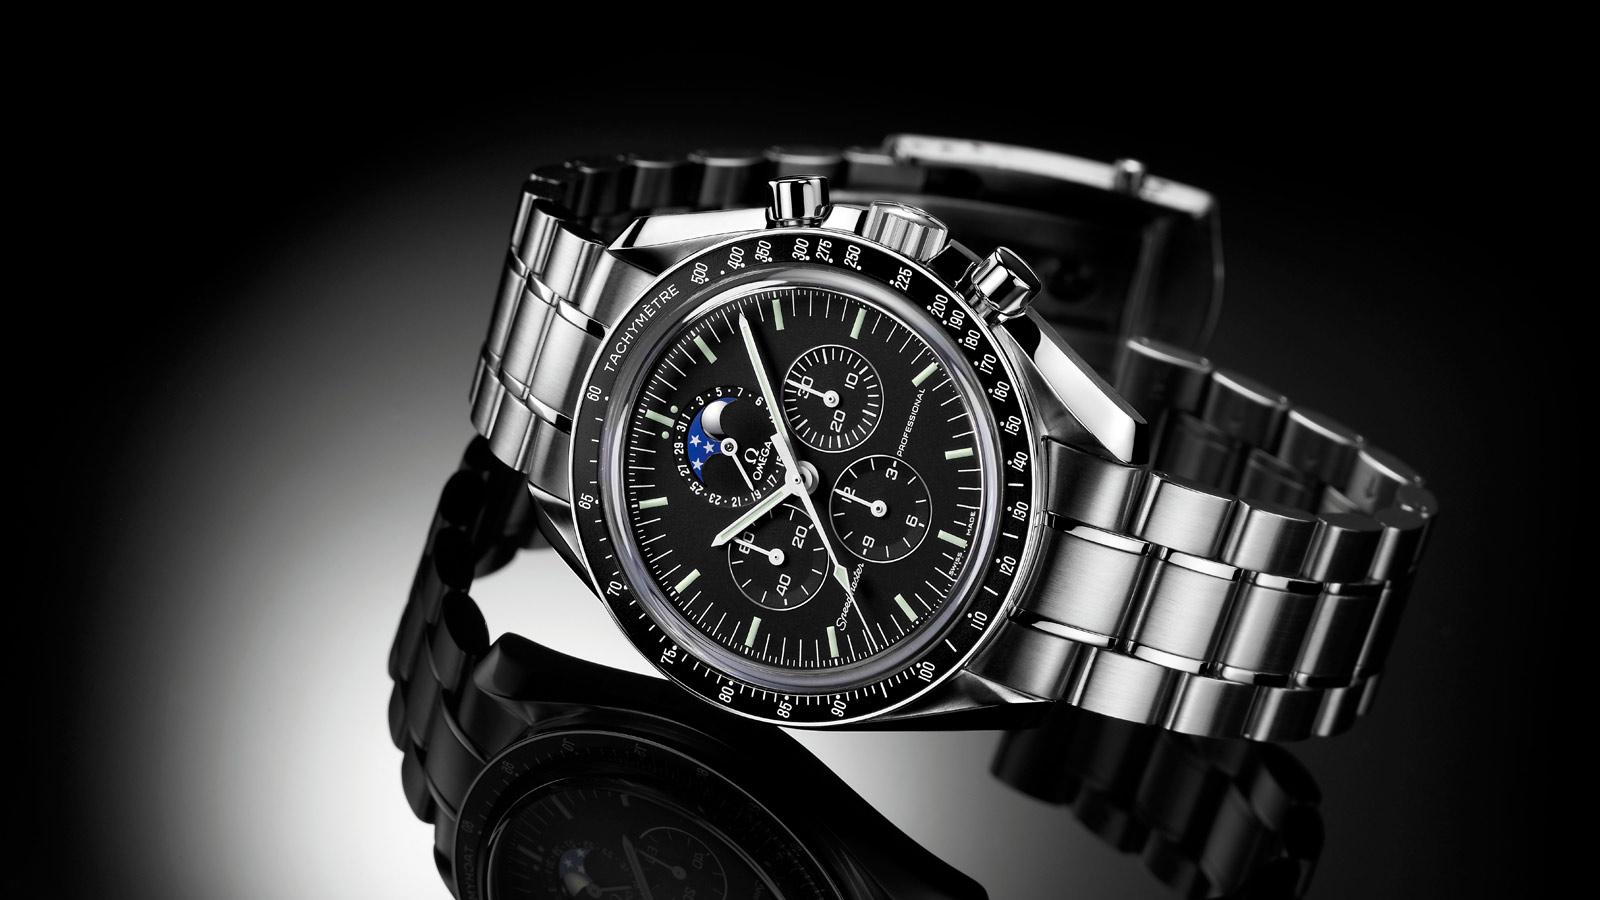 Omega Speedmaster Moonphase Precio relojes-reloj.es